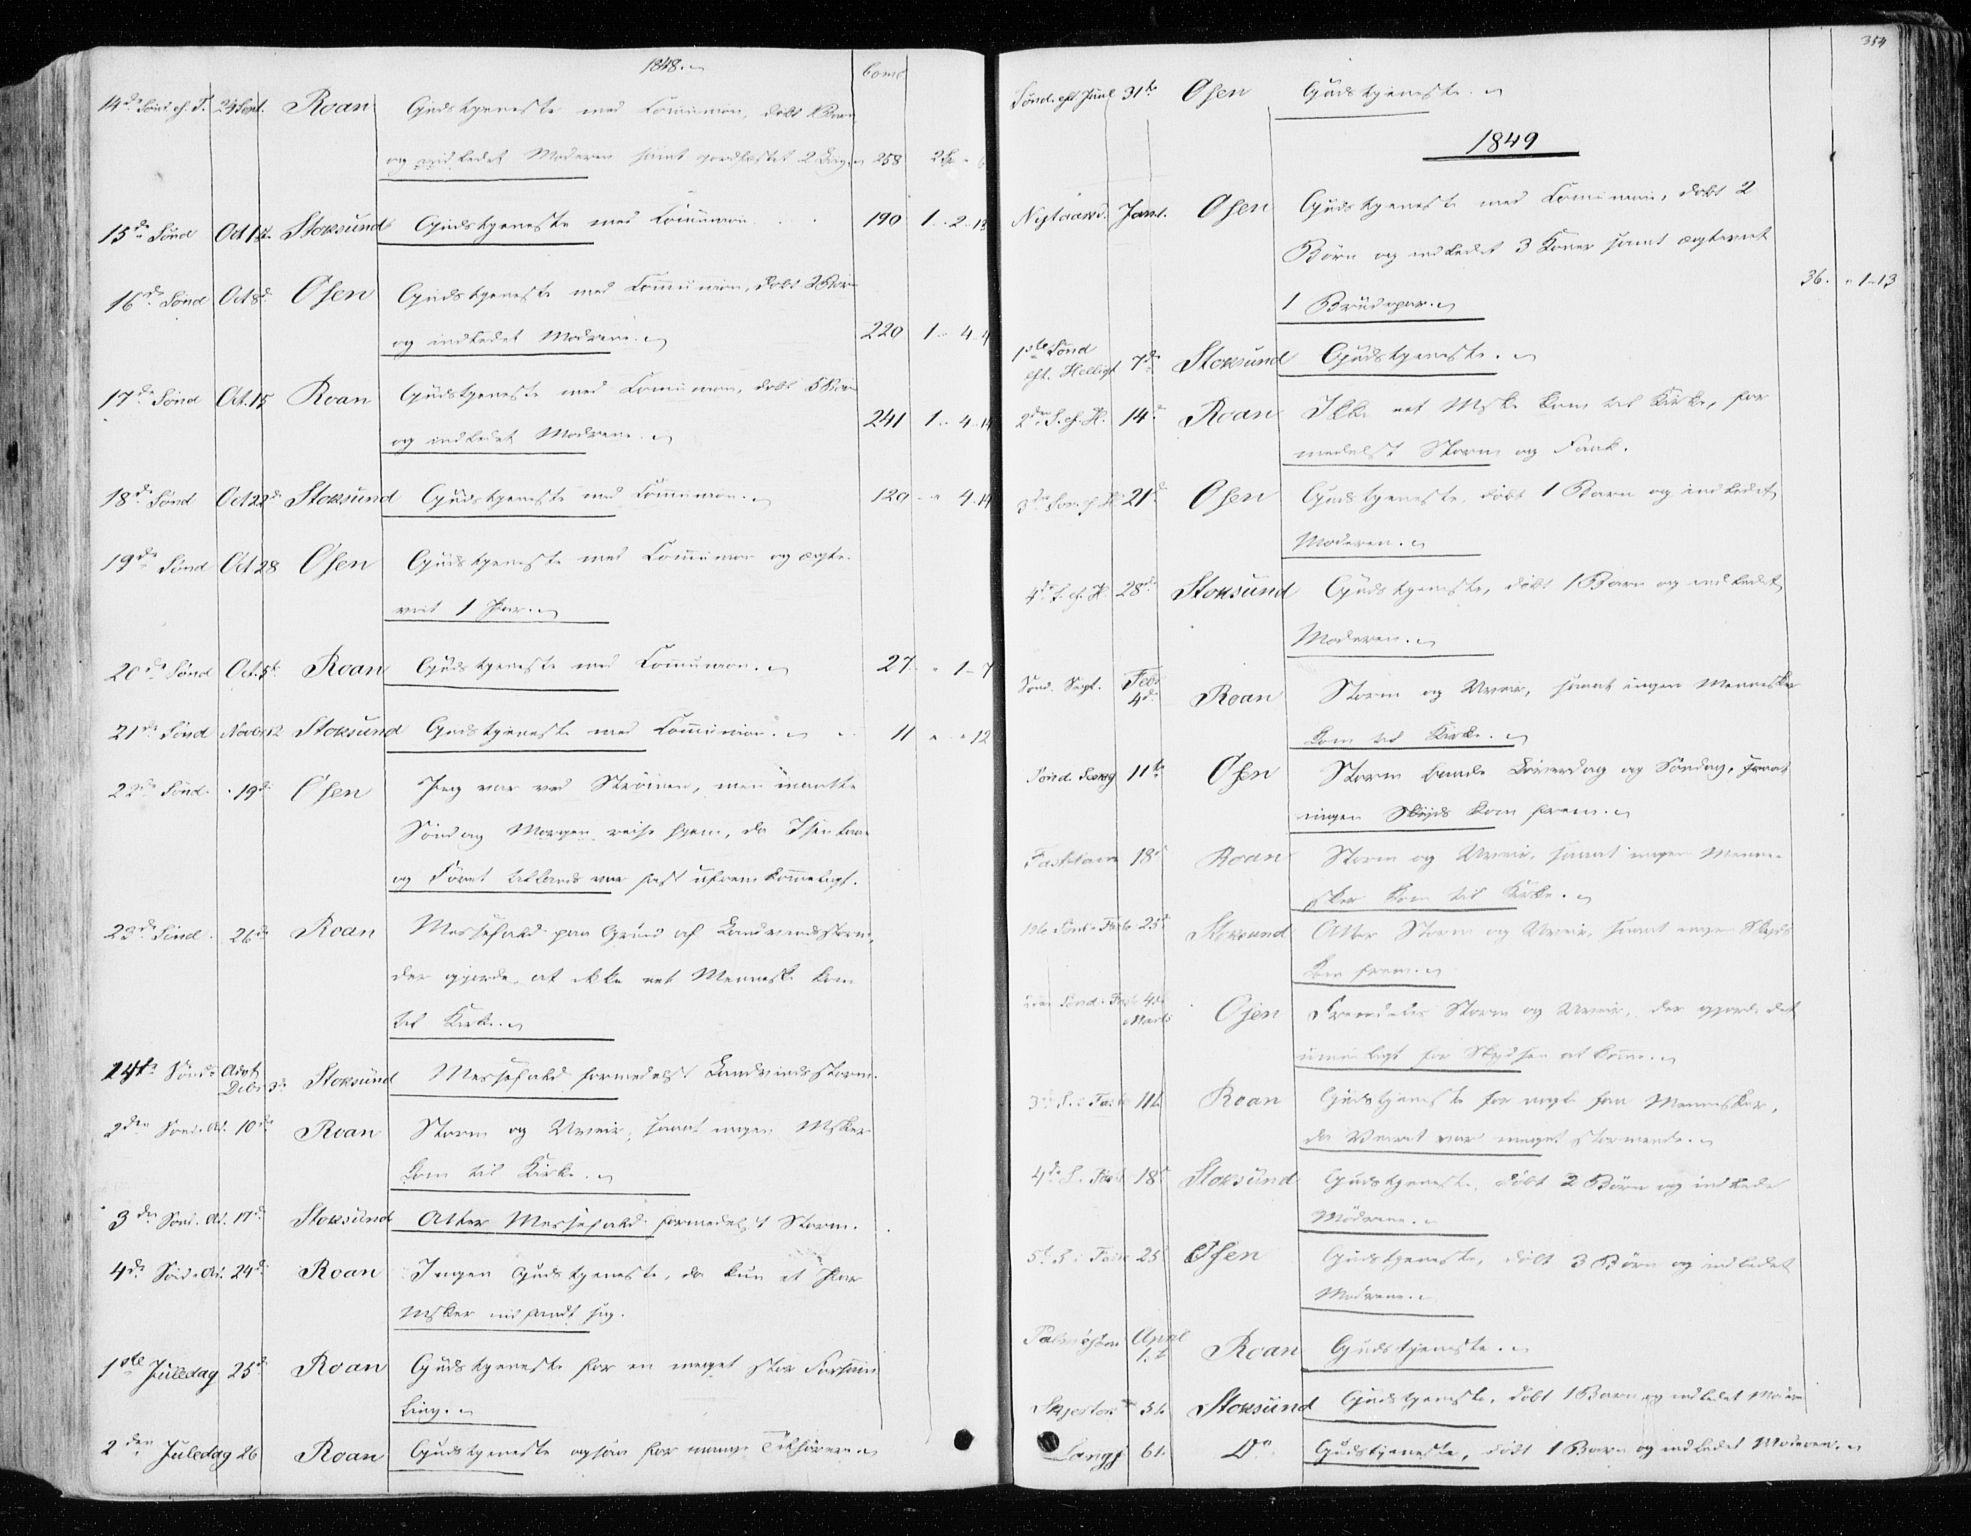 SAT, Ministerialprotokoller, klokkerbøker og fødselsregistre - Sør-Trøndelag, 657/L0704: Parish register (official) no. 657A05, 1846-1857, p. 354